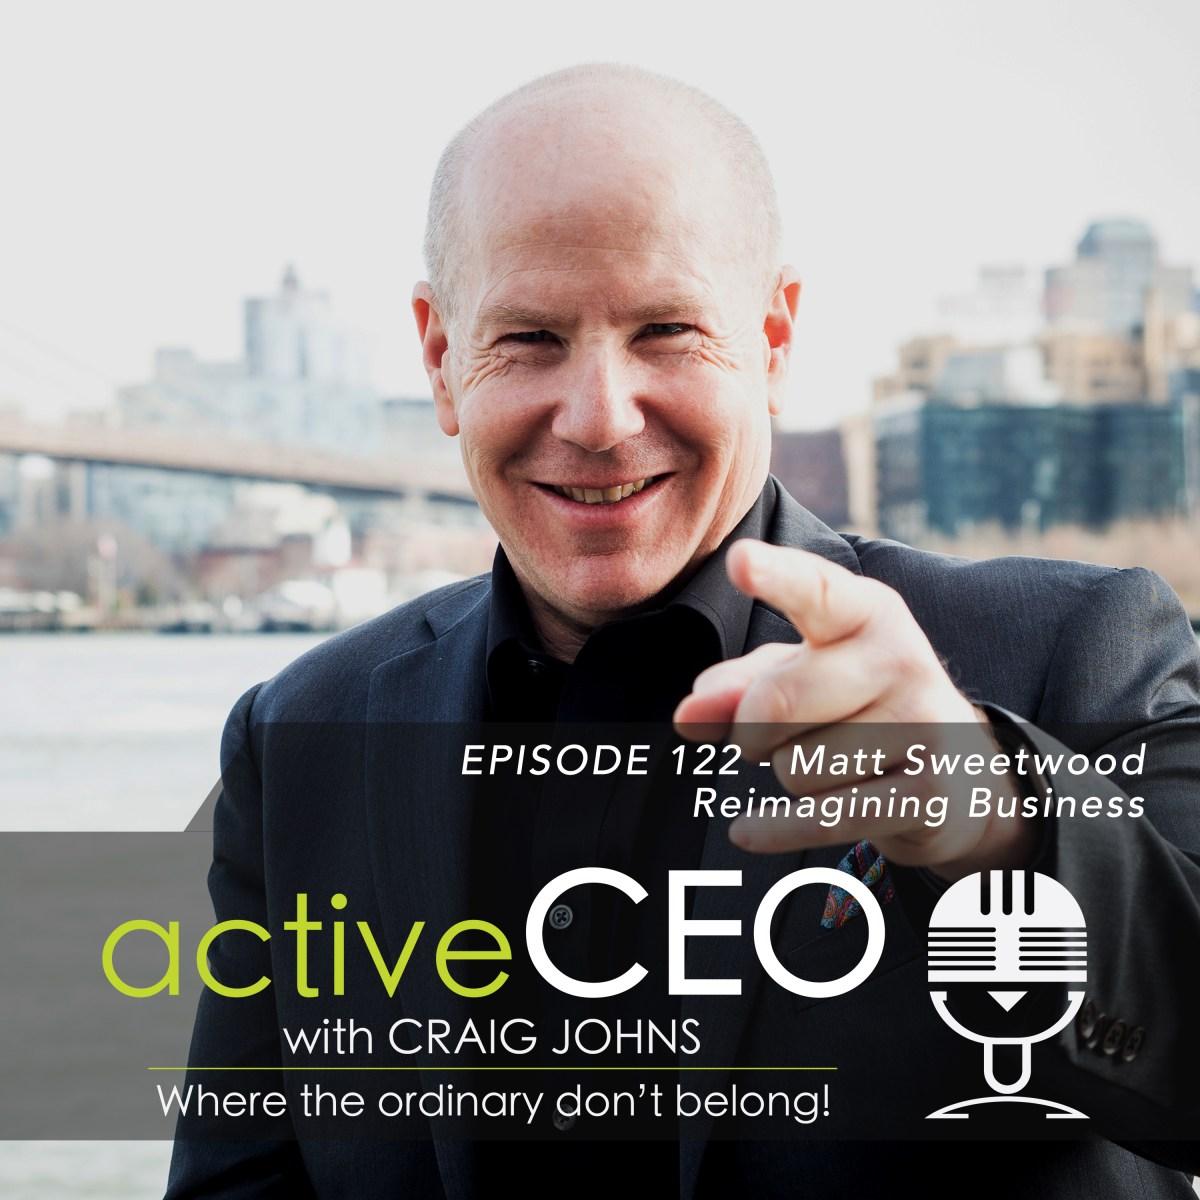 active CEO Podcast Matt Sweetwood Reimagining Business